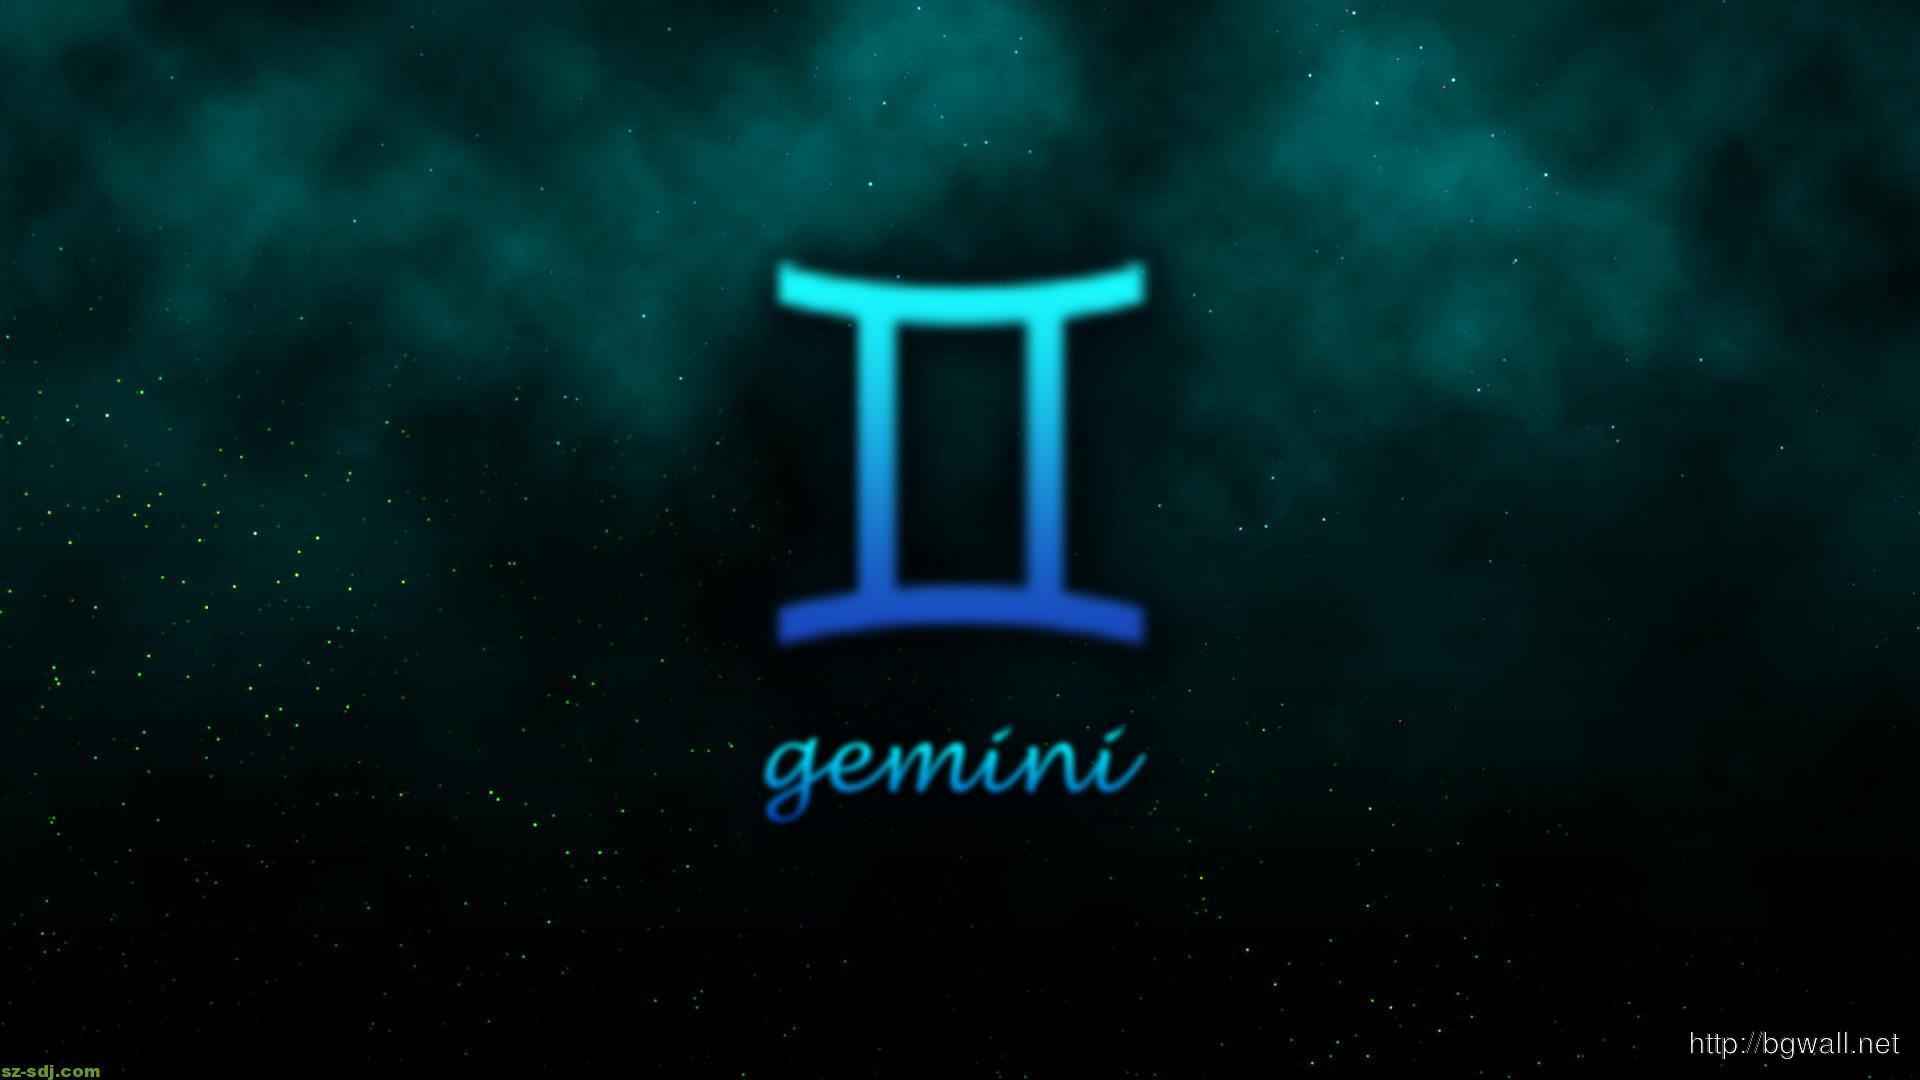 gemini-zodiac-logo-wallpaper-high-defintion